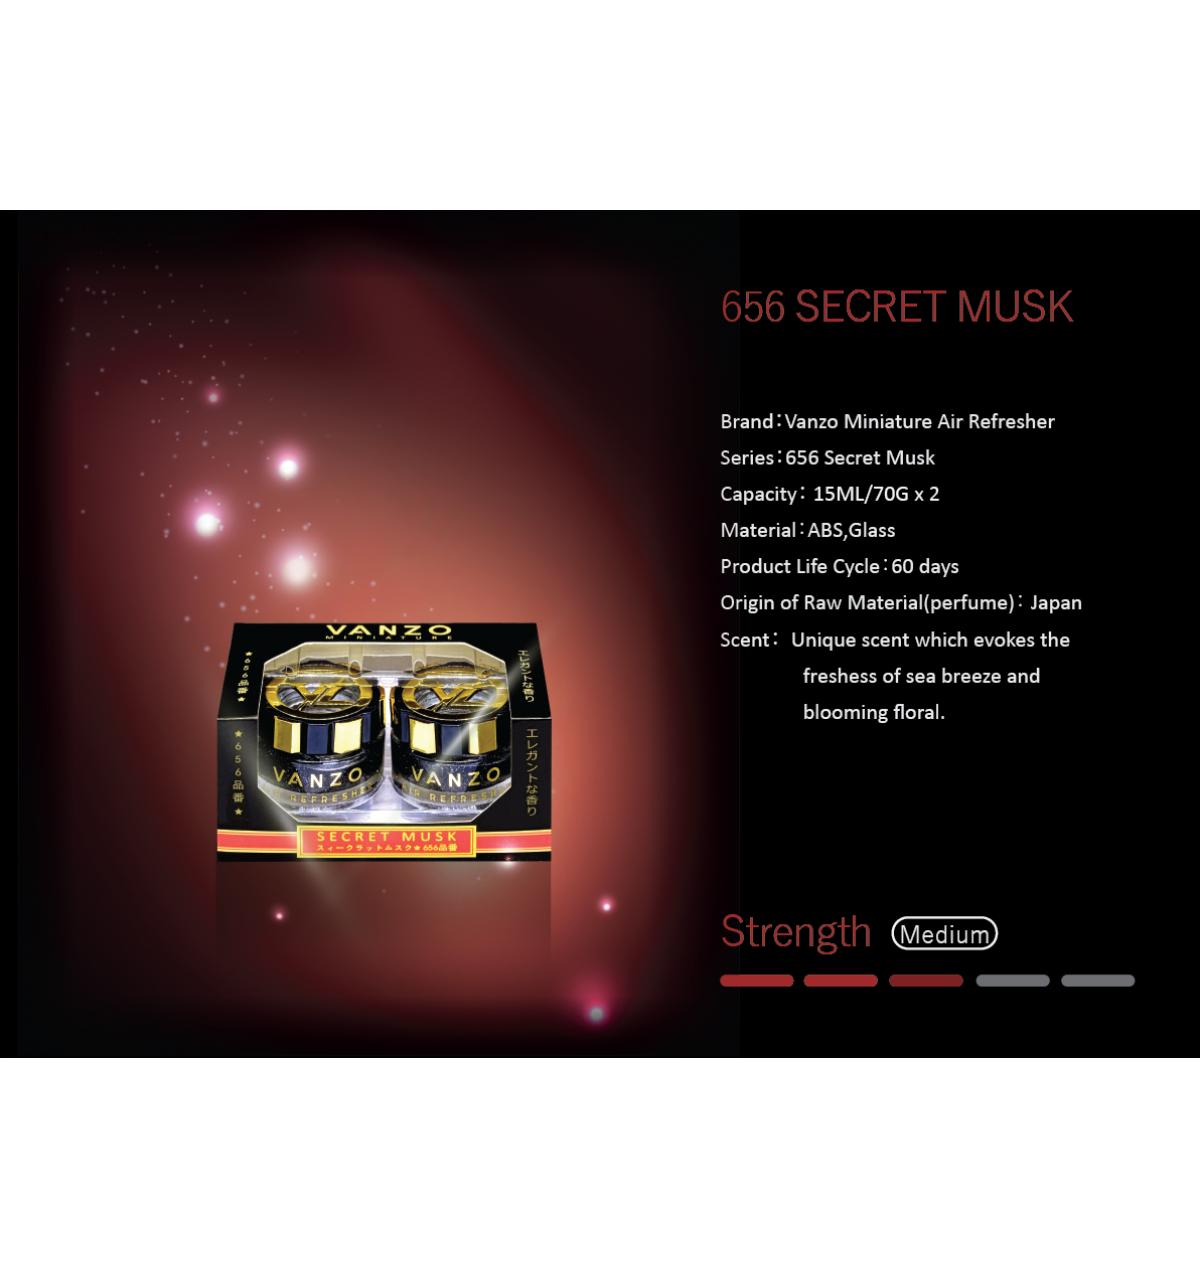 VANZO 656 SECRET MUSK AIR FRESHENER (MINI)